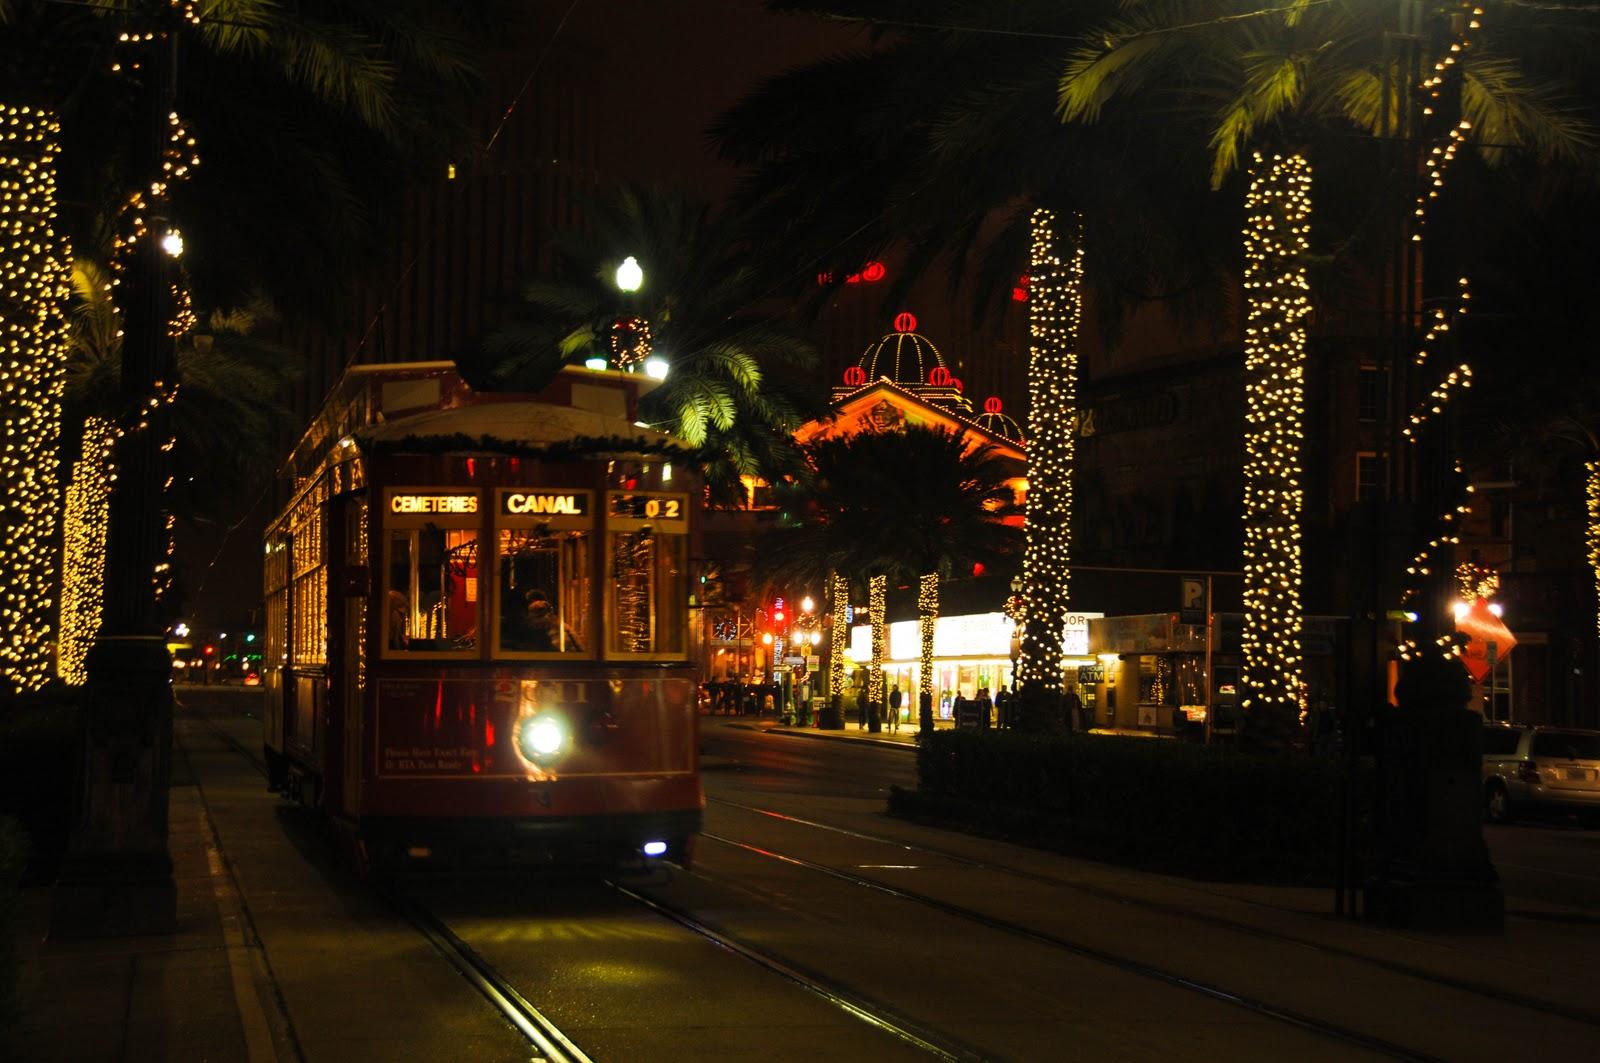 Canal Street Christmas, Courtesy The Wayfare